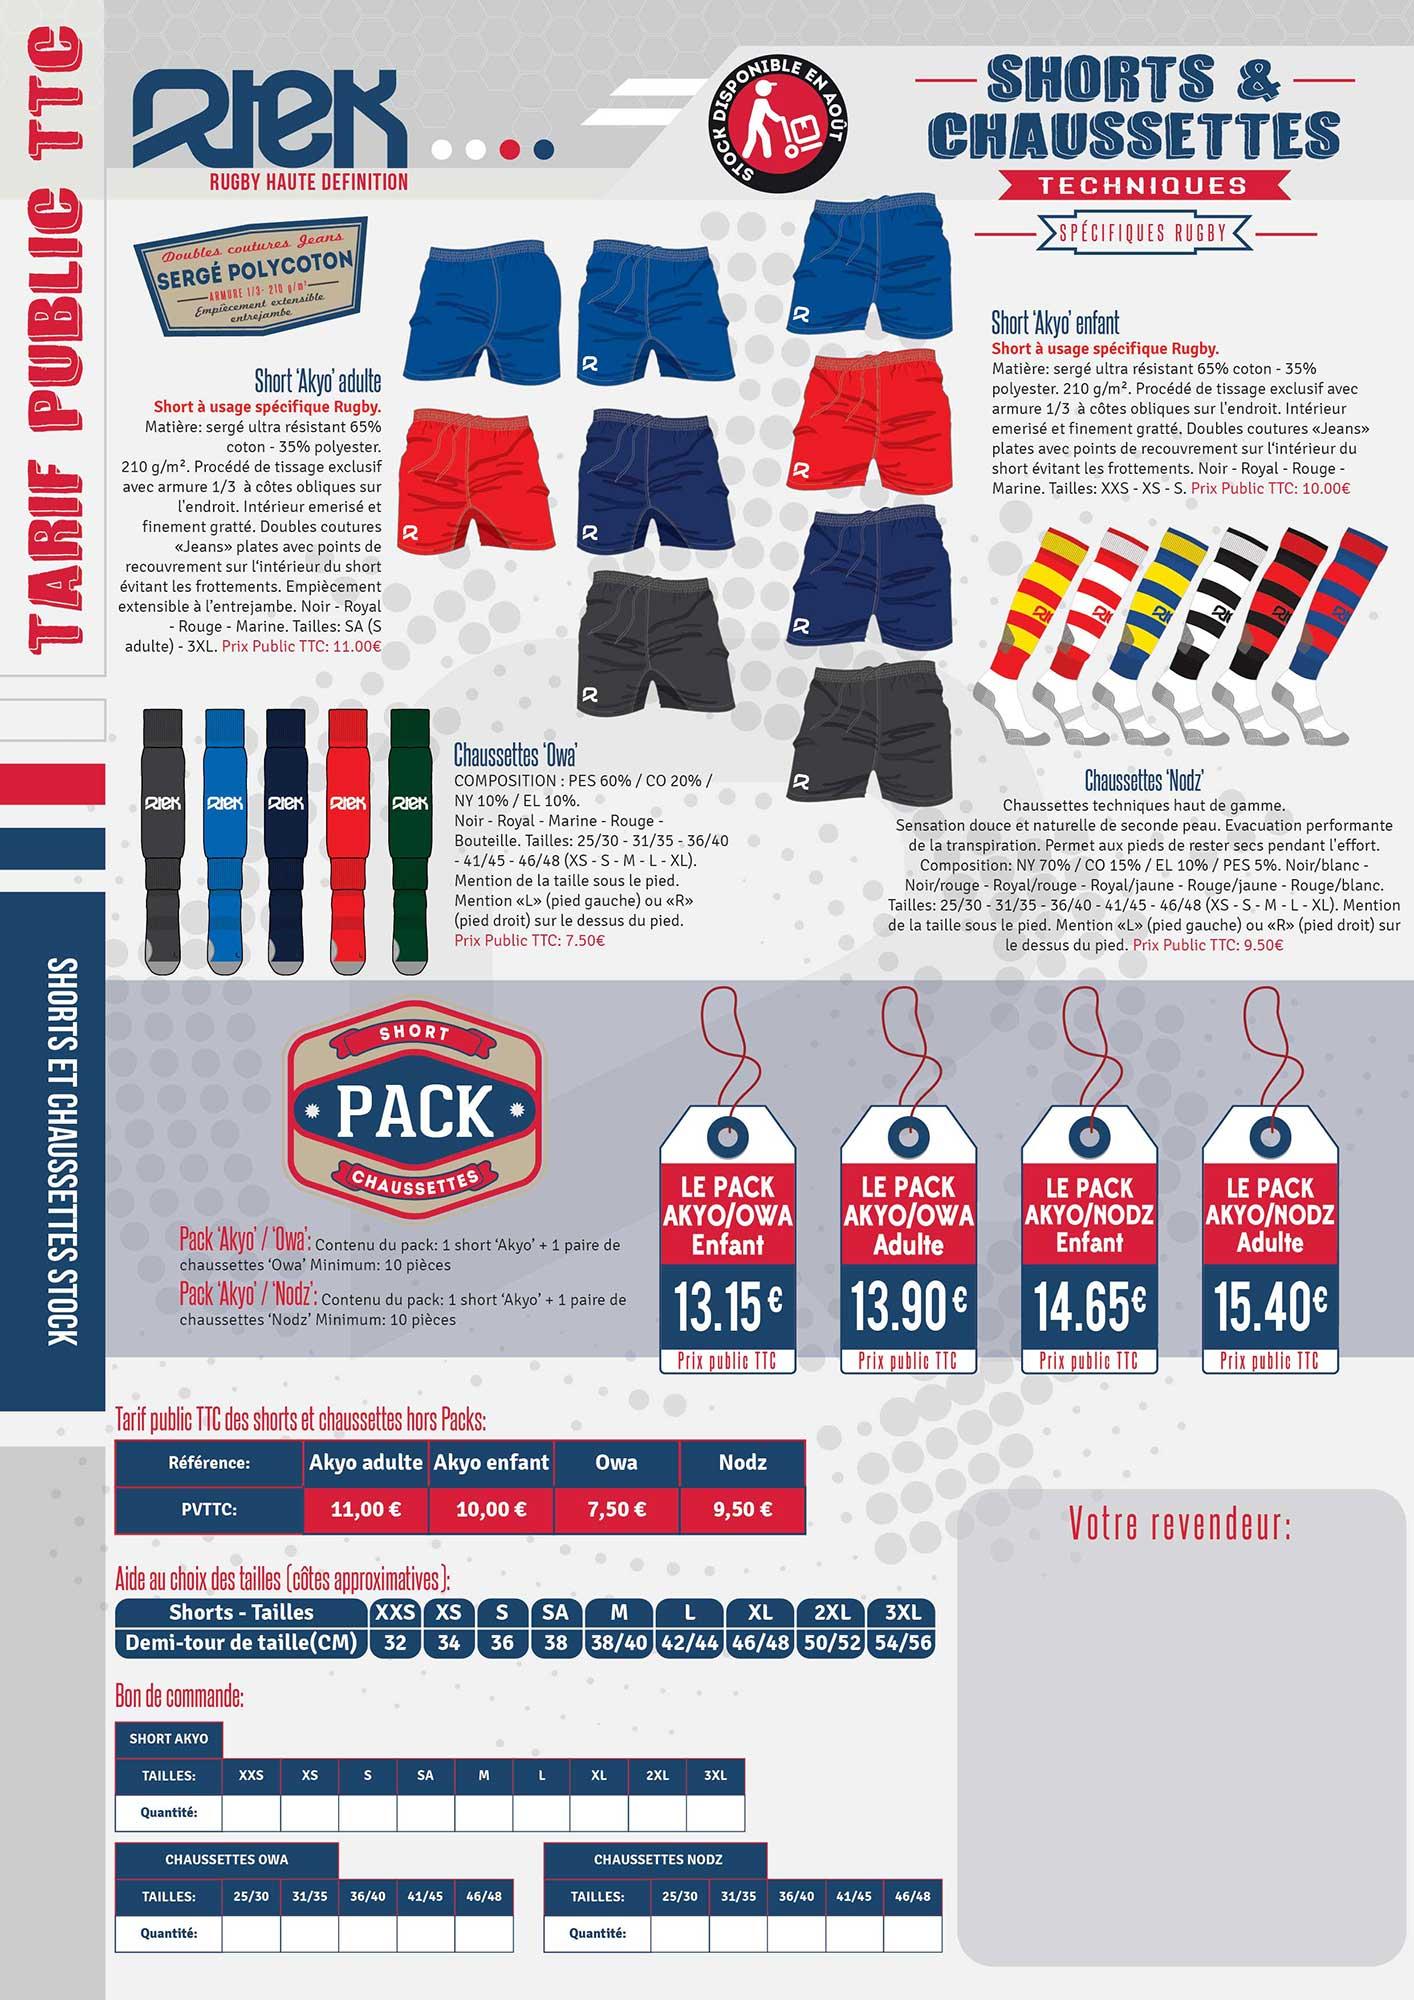 Pack Short/Chaussettes rugby pas cher RTEK